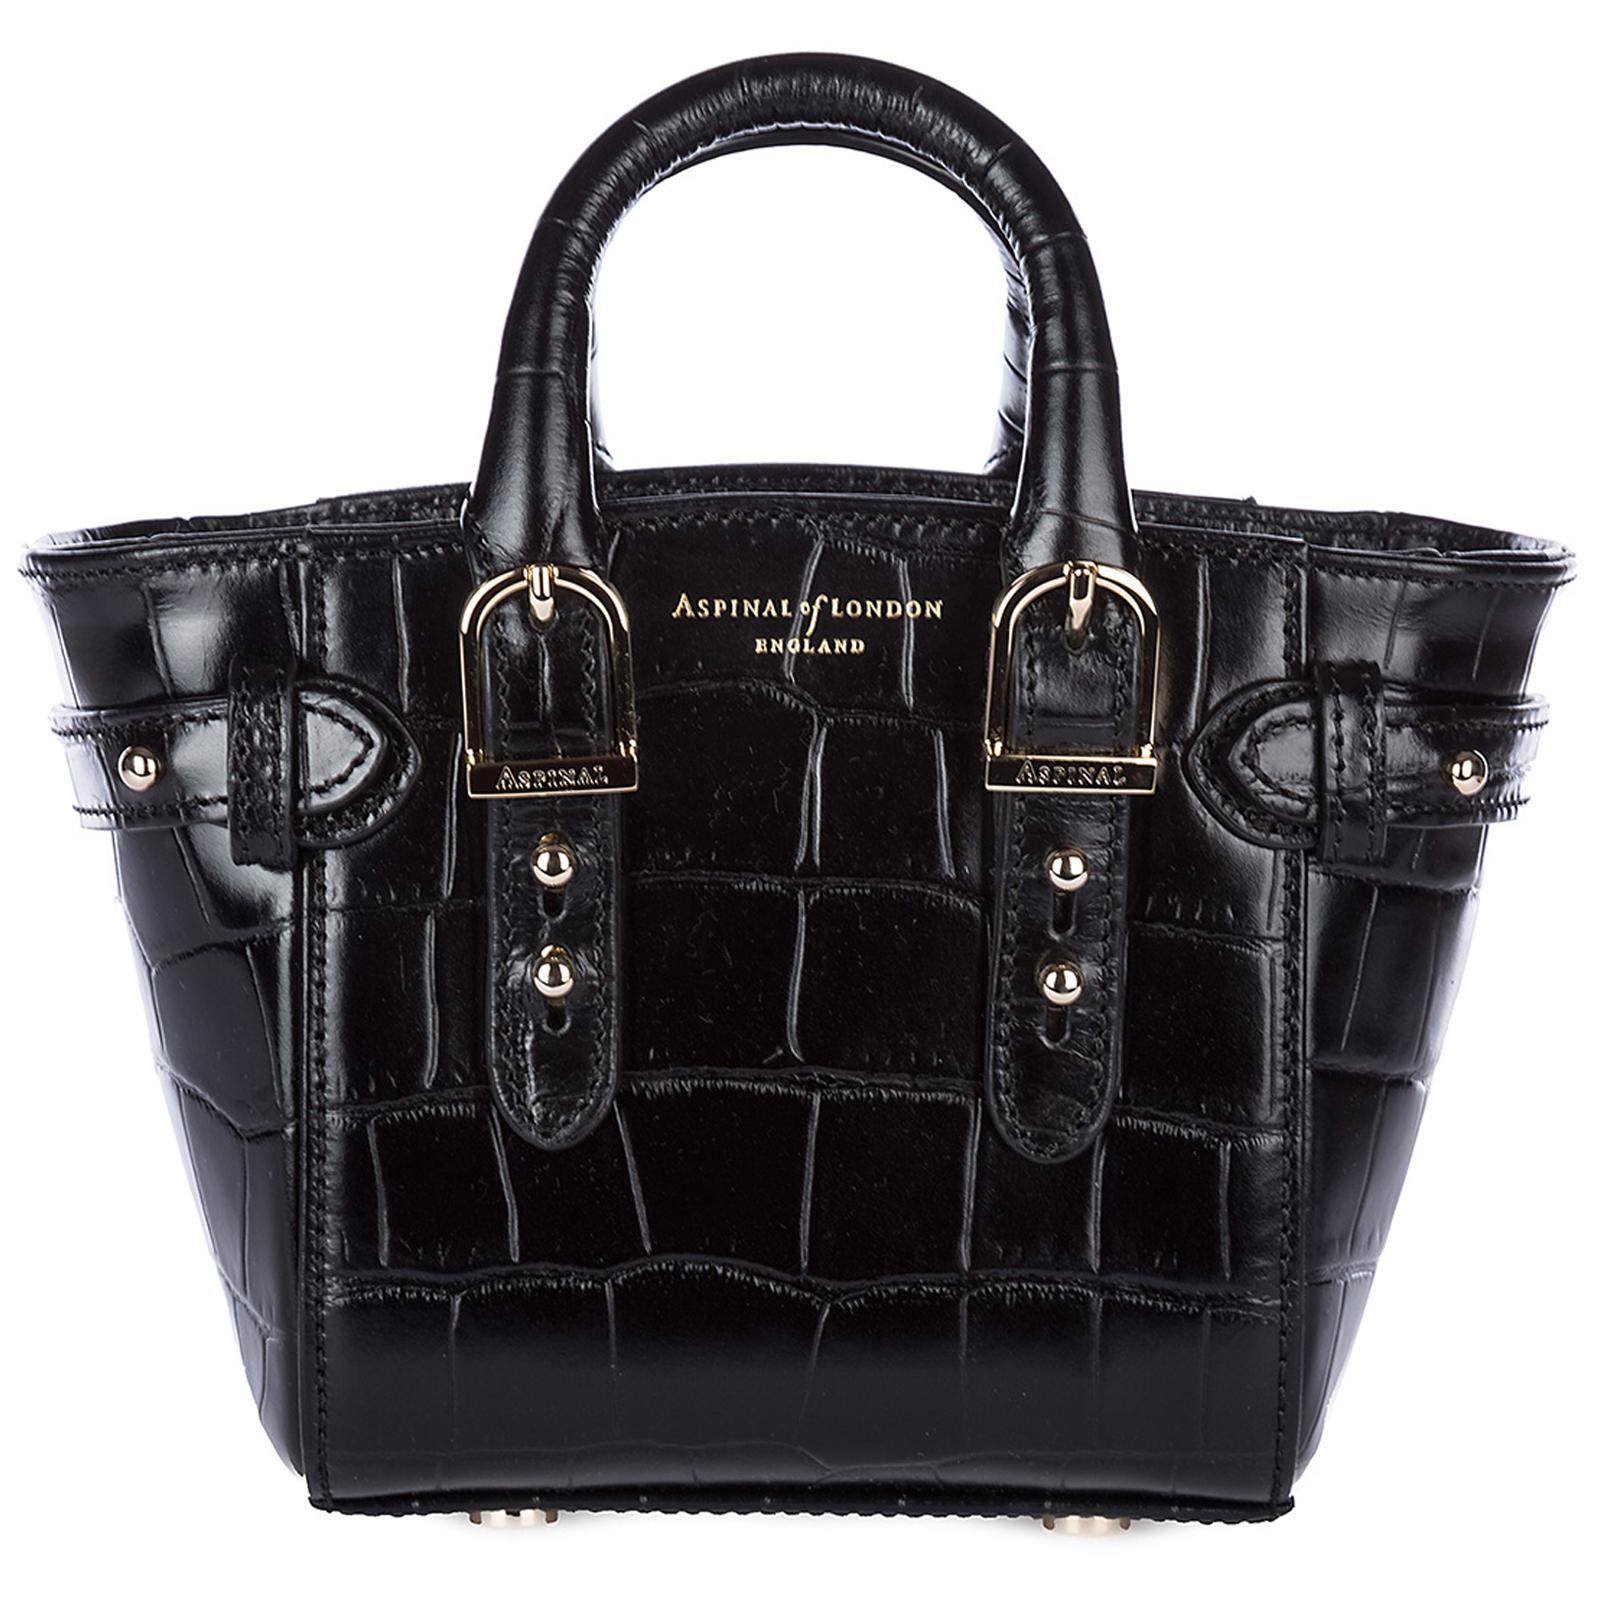 8f234b3461 Aspinal of London Women s handbag cross-body messenger bag purse micro  marylebone